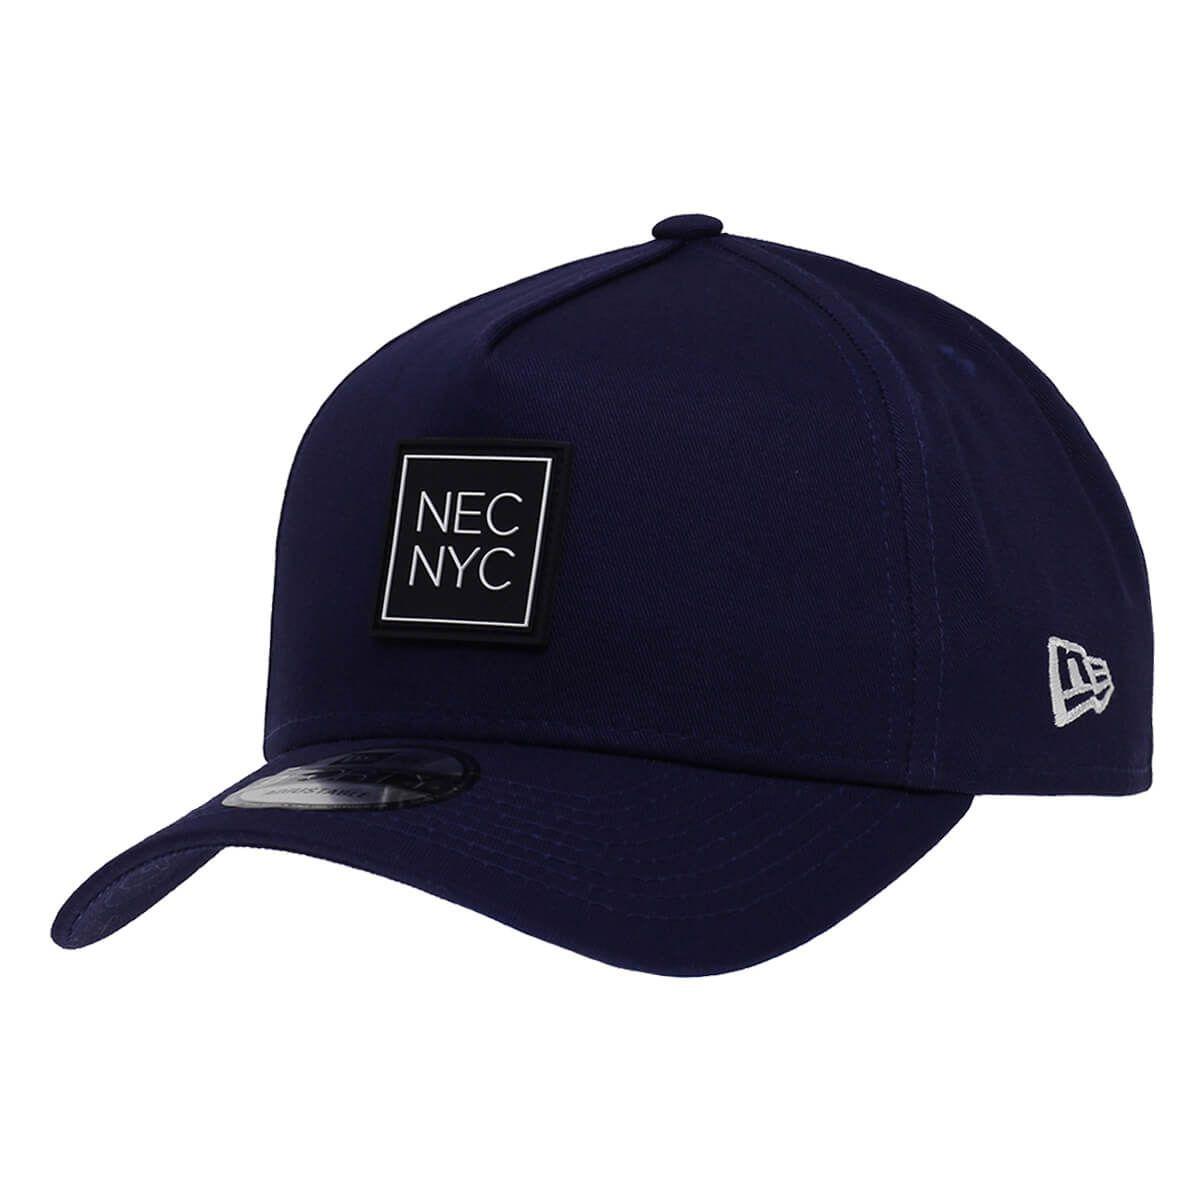 Boné New Era Aba Curva 940 SN Brand AF NEC NYC Rubber Azul Escuro